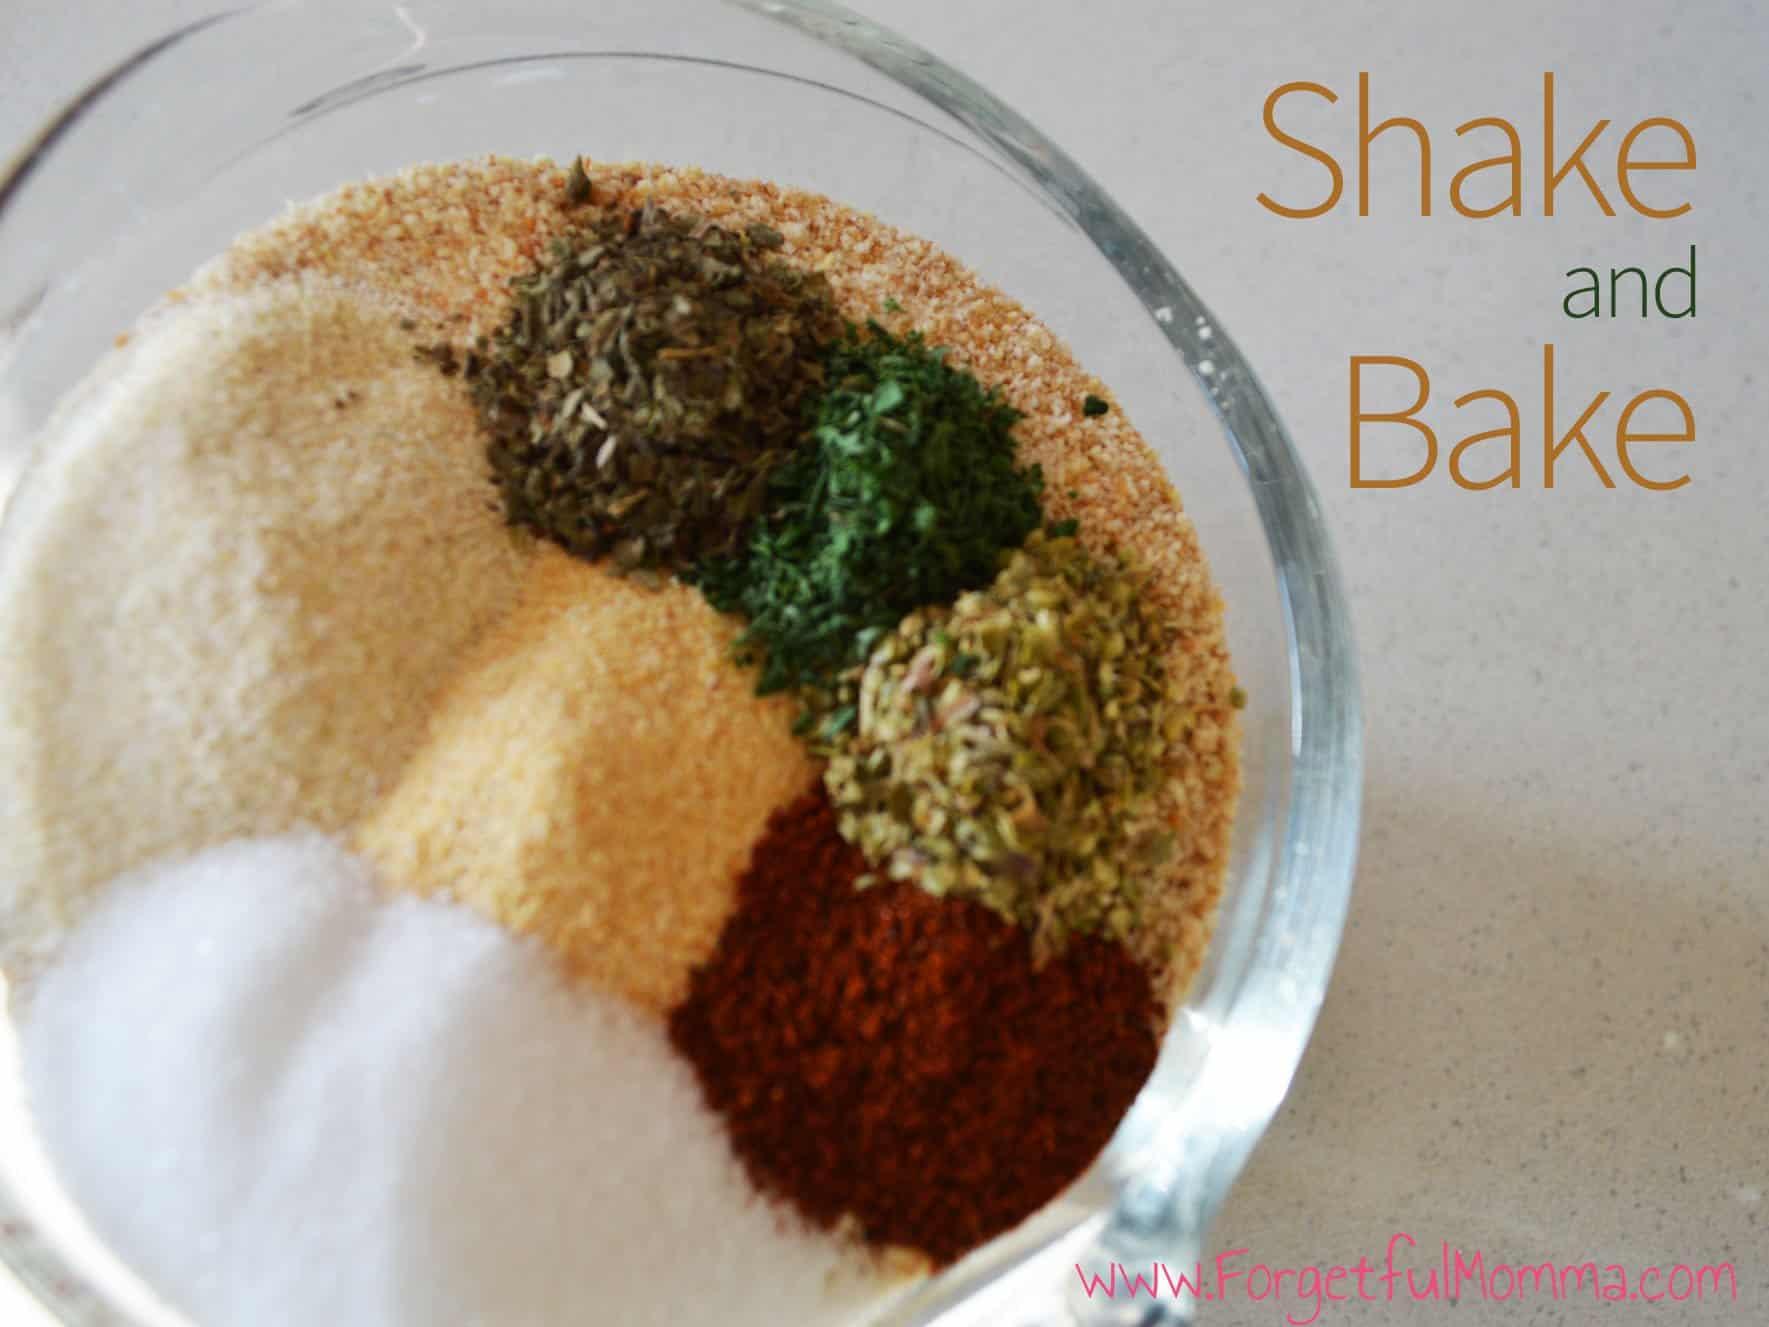 Shake and Bake Recipe